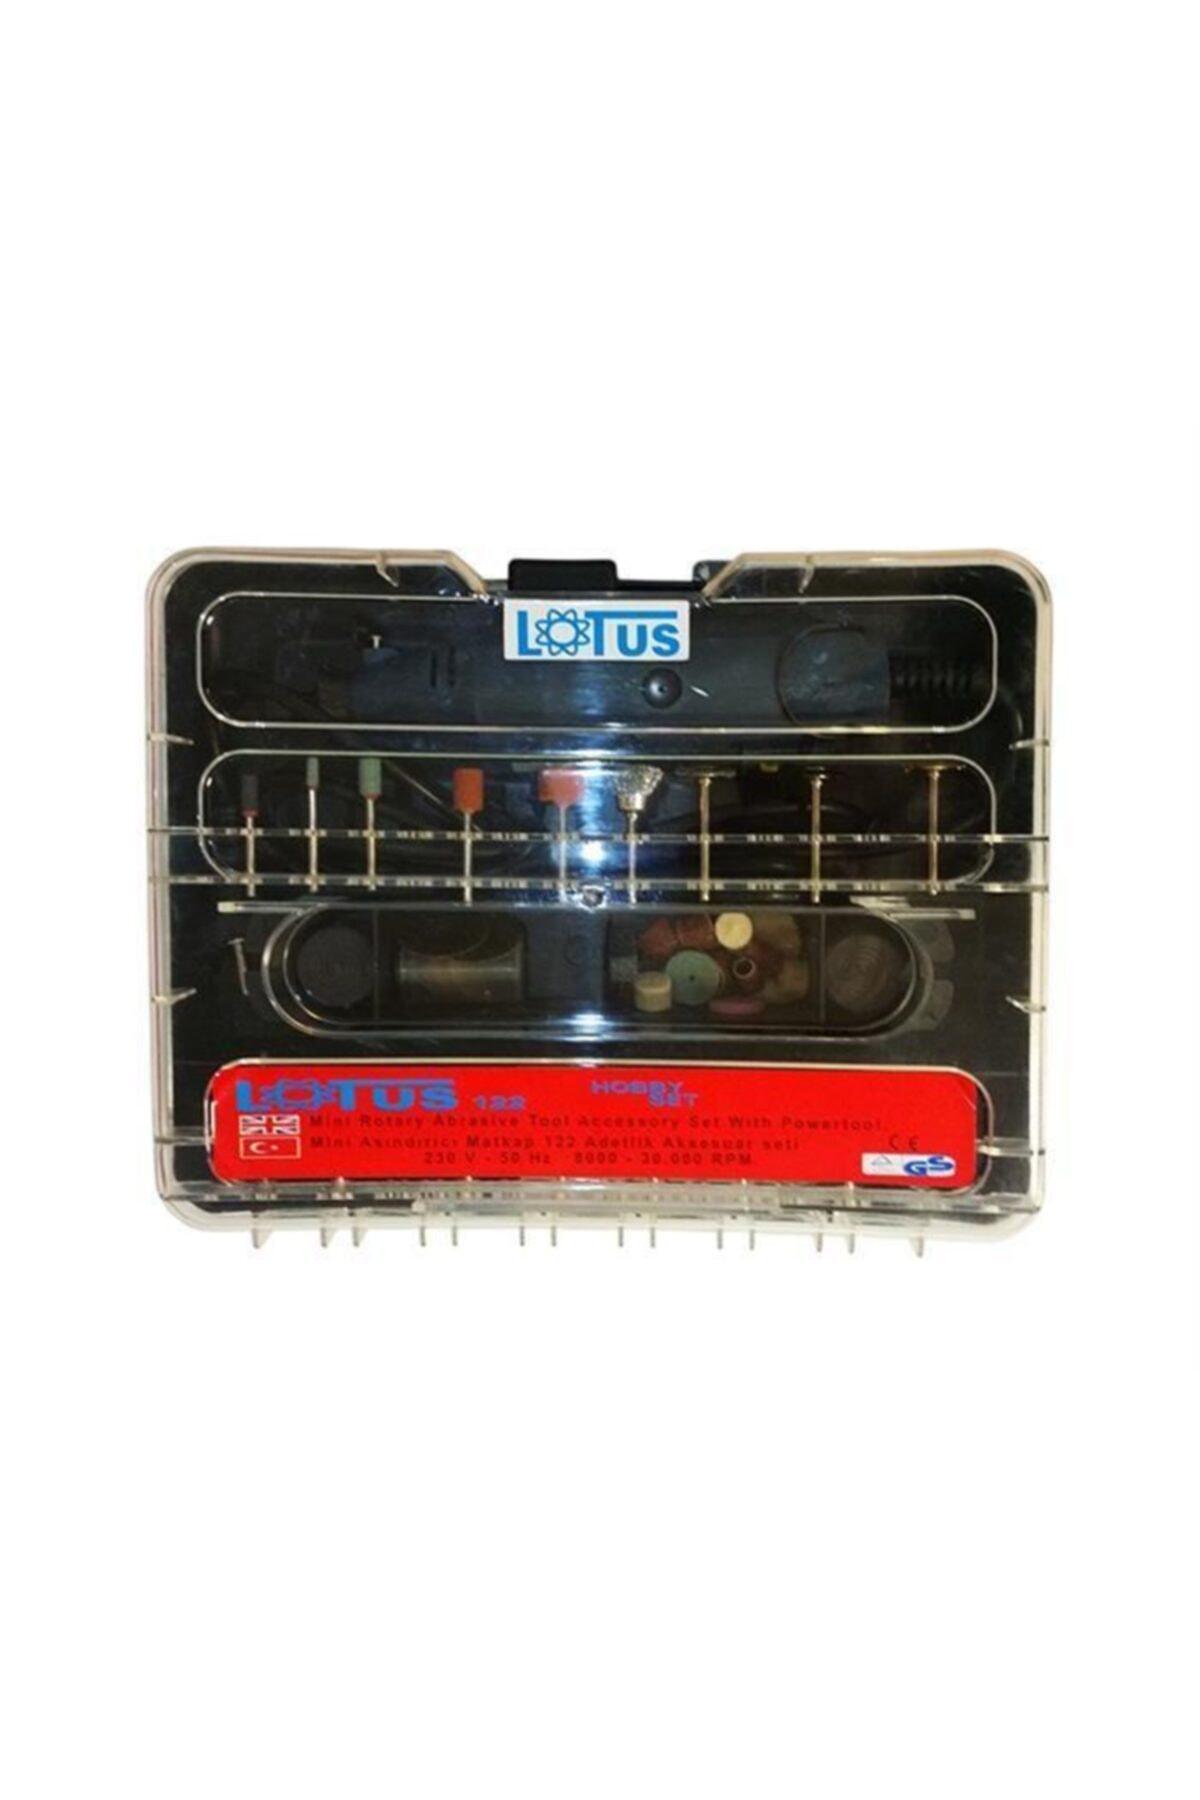 Lotus 122 Parçalı Mini Matkap Gravür Hobi Seti Plastik Kutulu 1